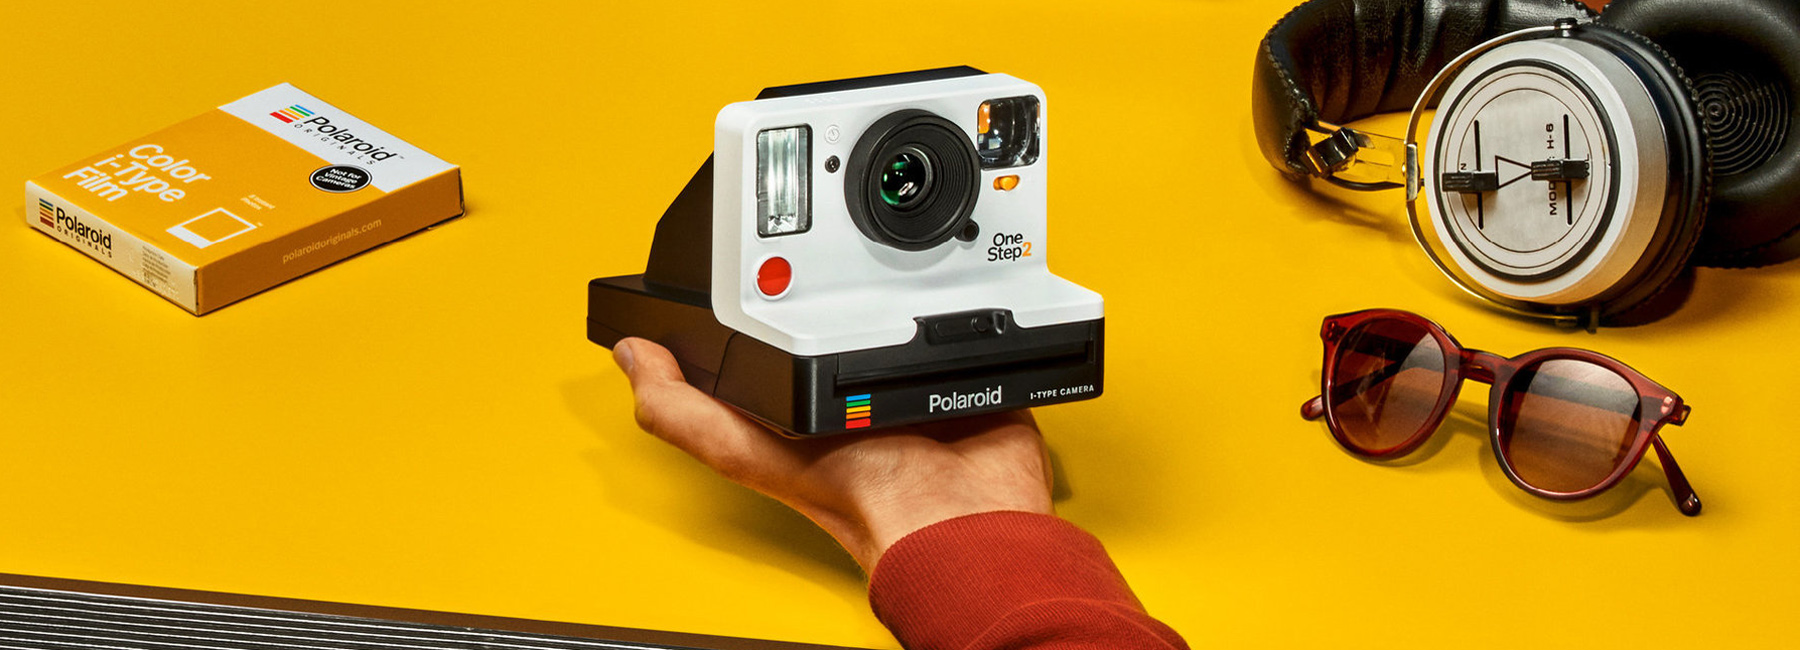 polaroid-onestep2-i-type-camera-designboom-header